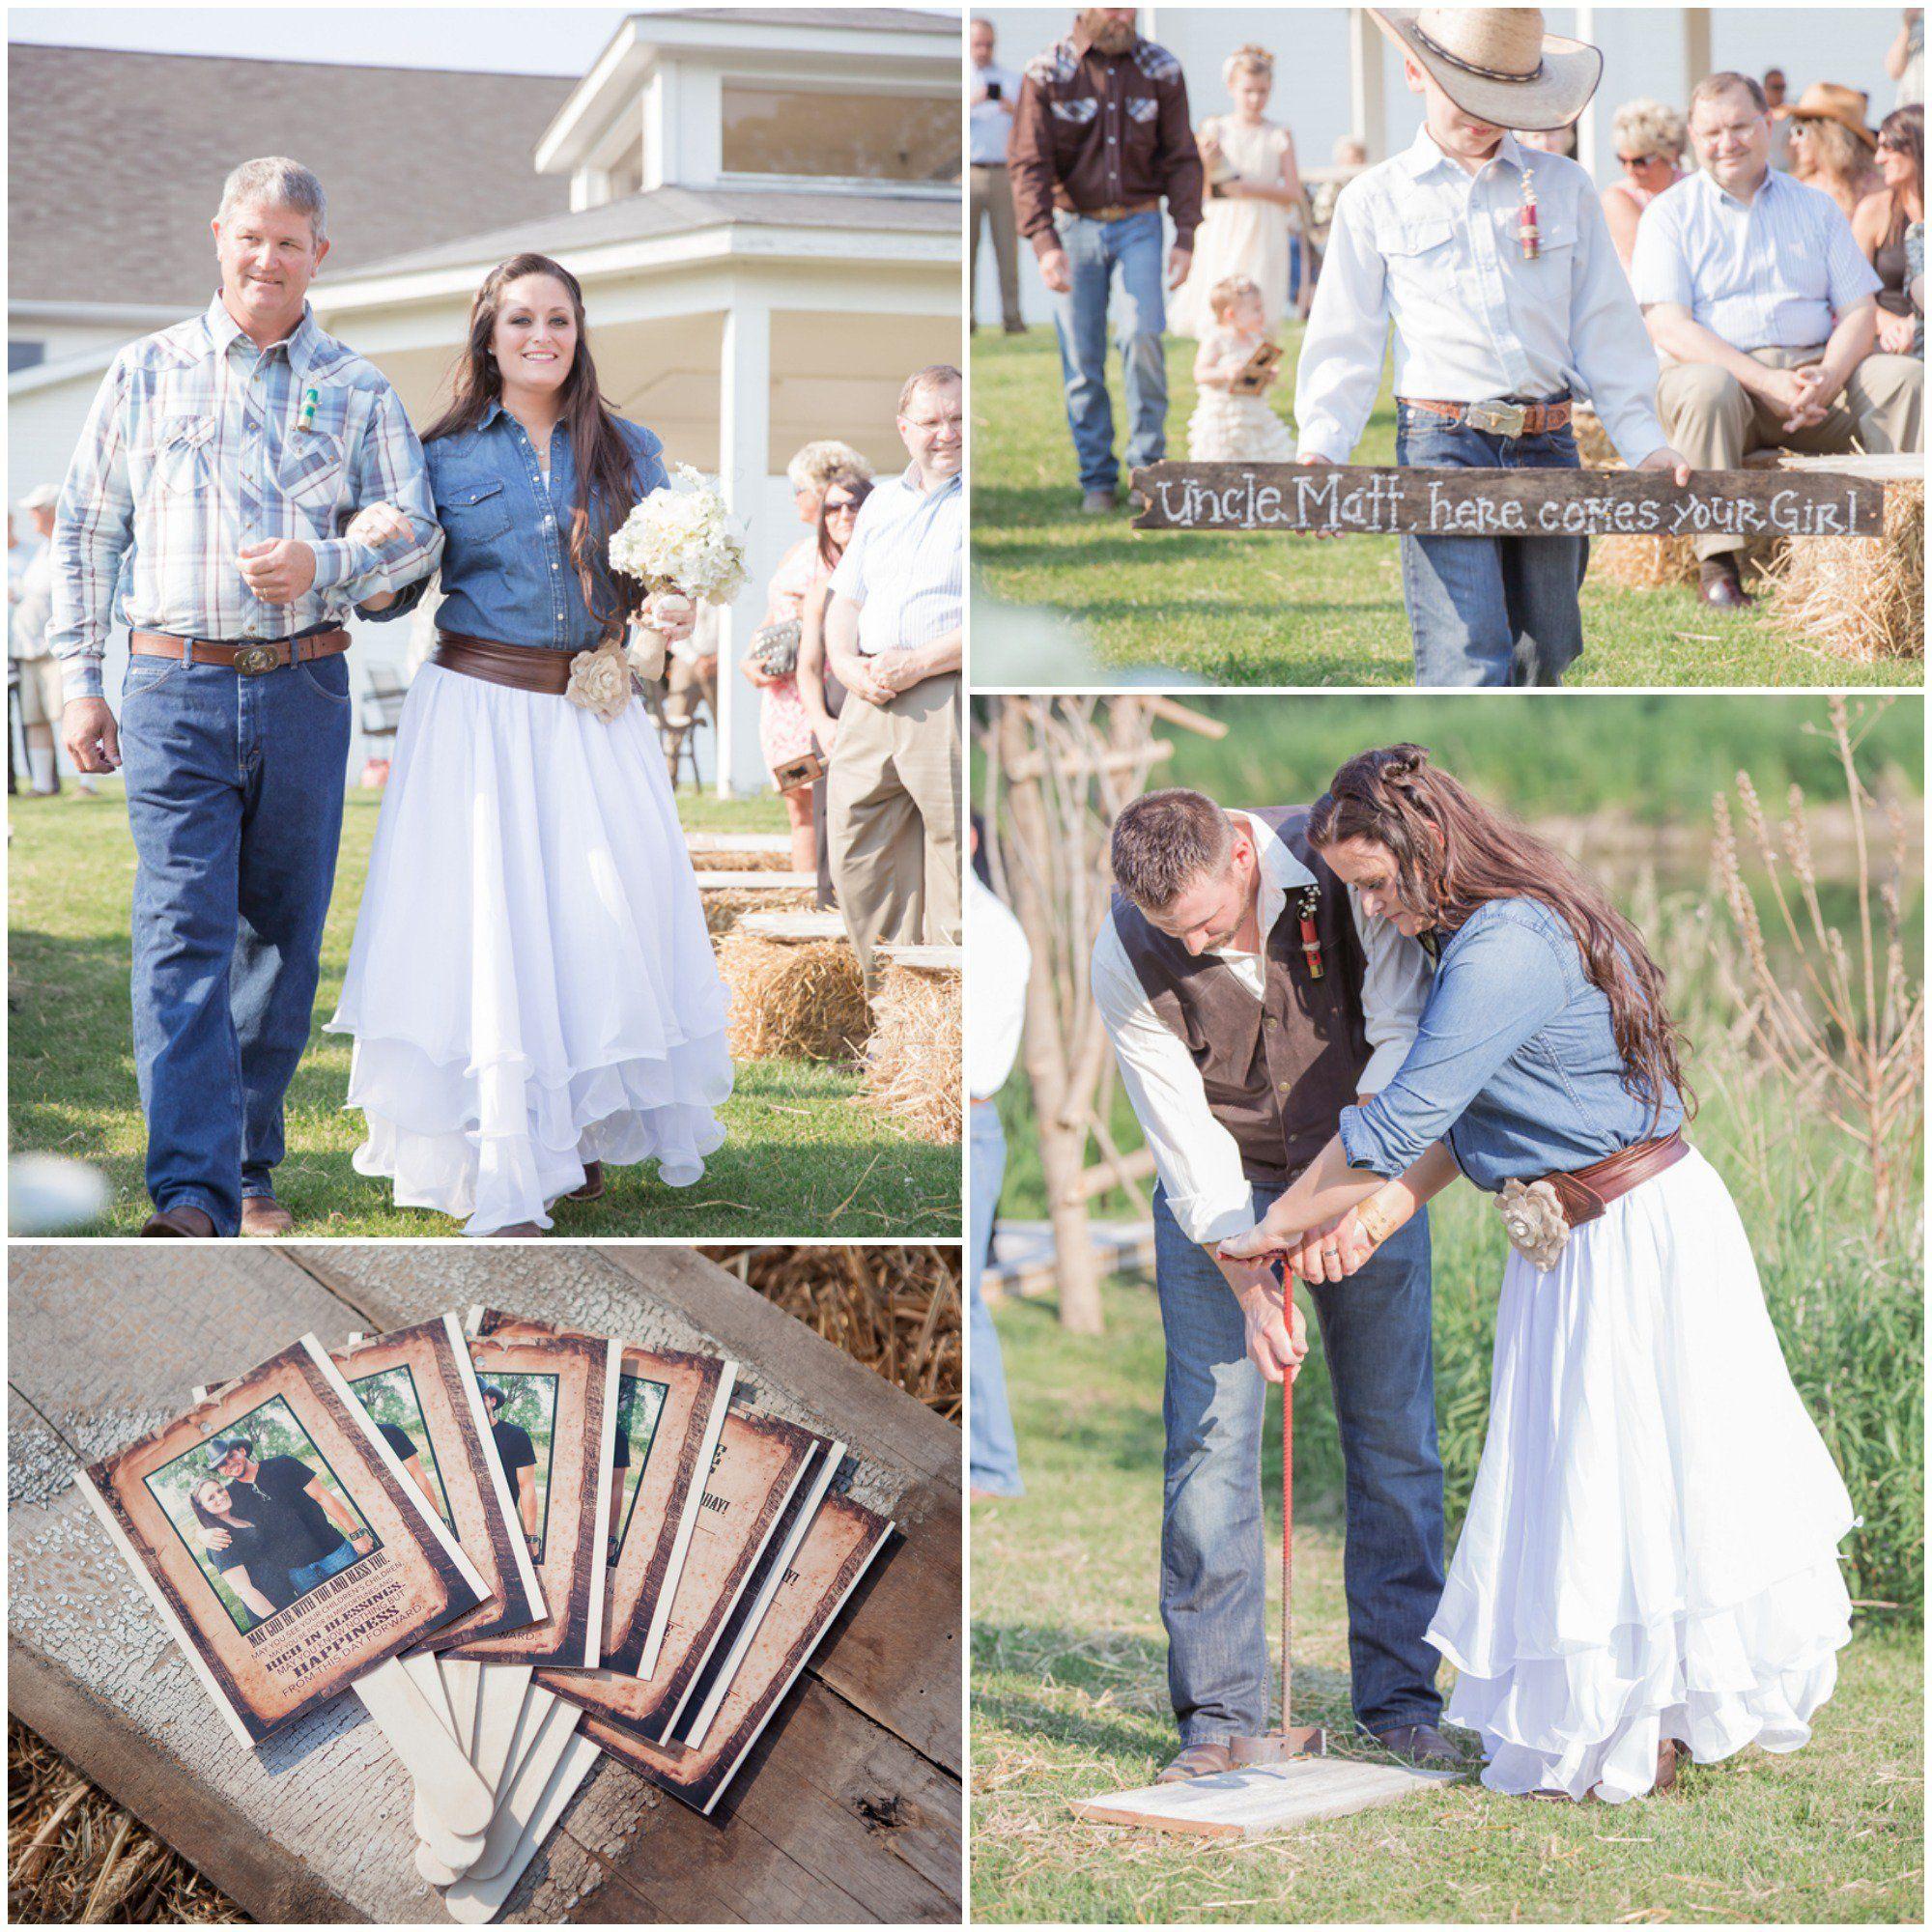 Denim Wedding Gown: Western Style Wedding In Denim And Jeans